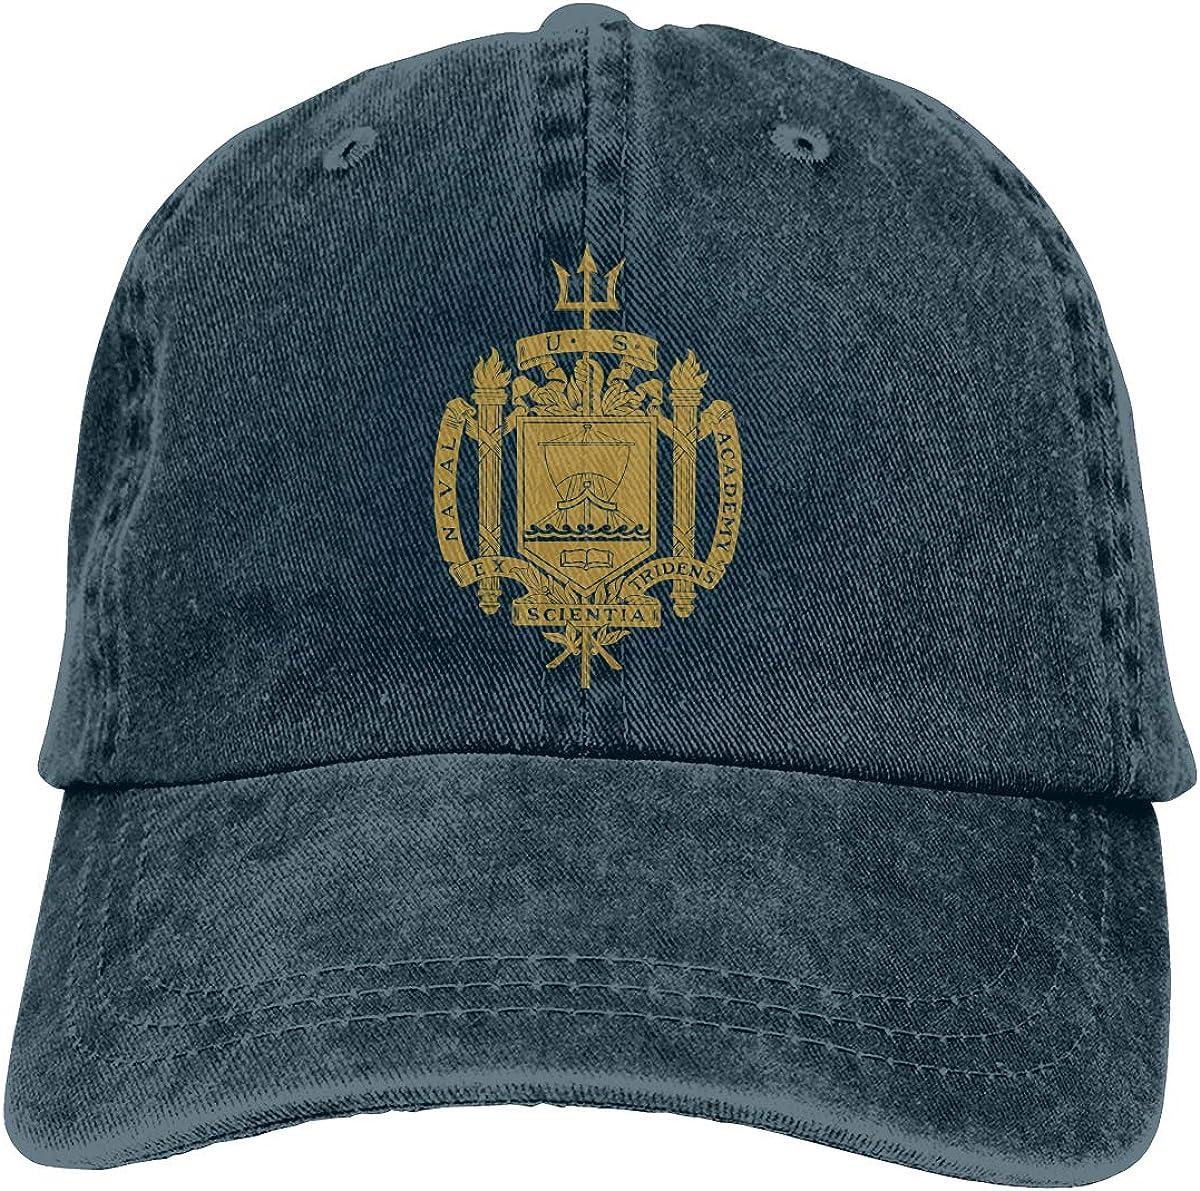 Usna Commemorate Casquette Cap Vintage Adjustable Unisex Baseball Hat